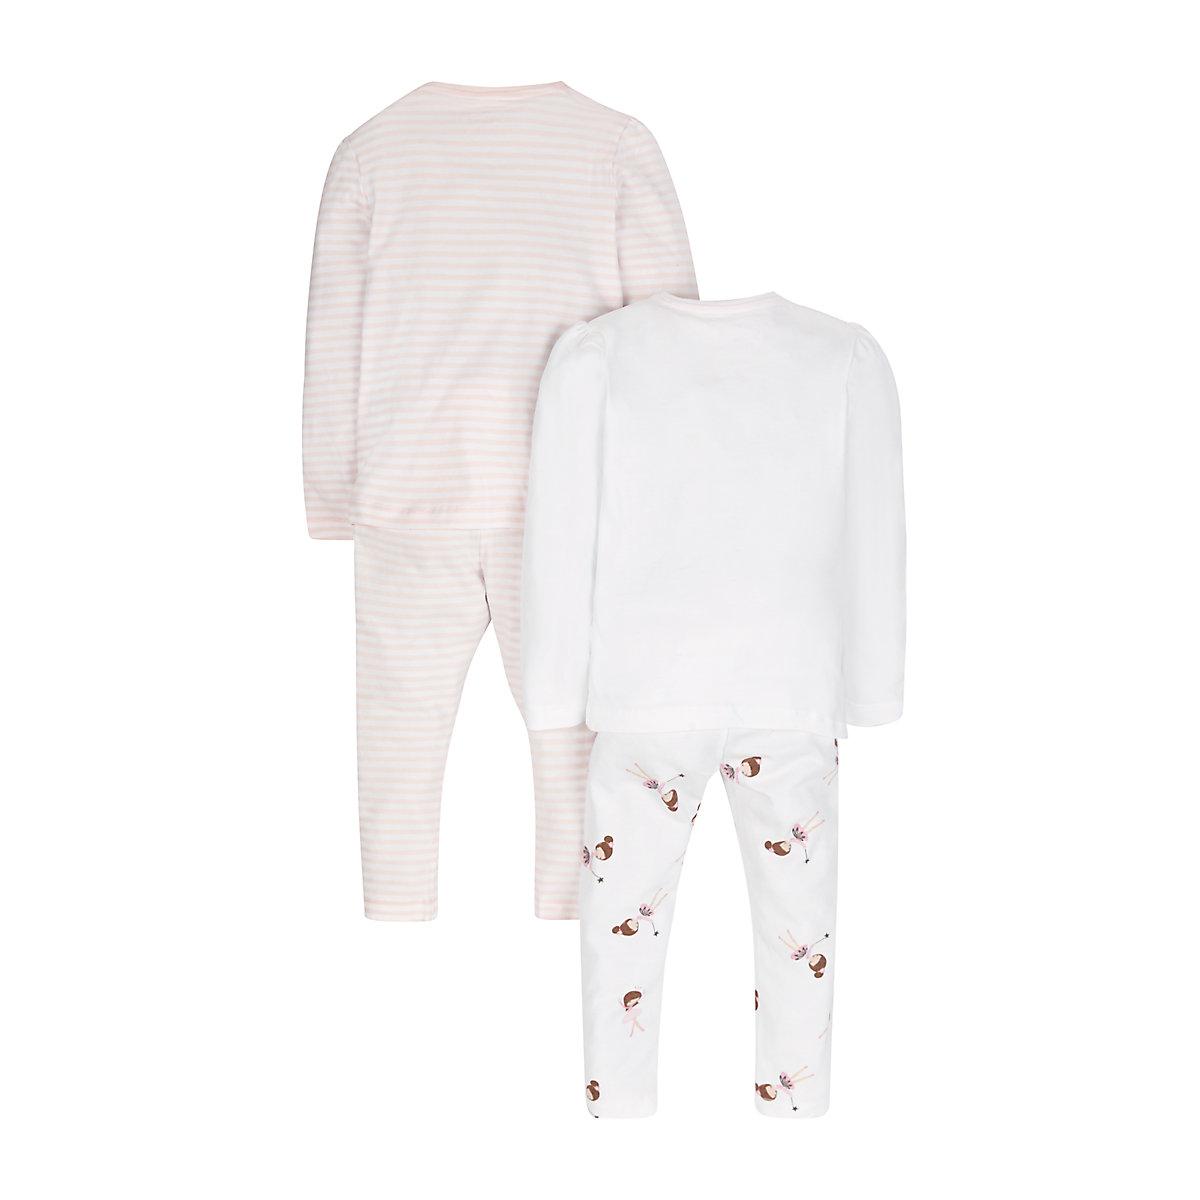 B-Toddler-Girl-039-s-Ballerina-Pyjamas-2-Pack